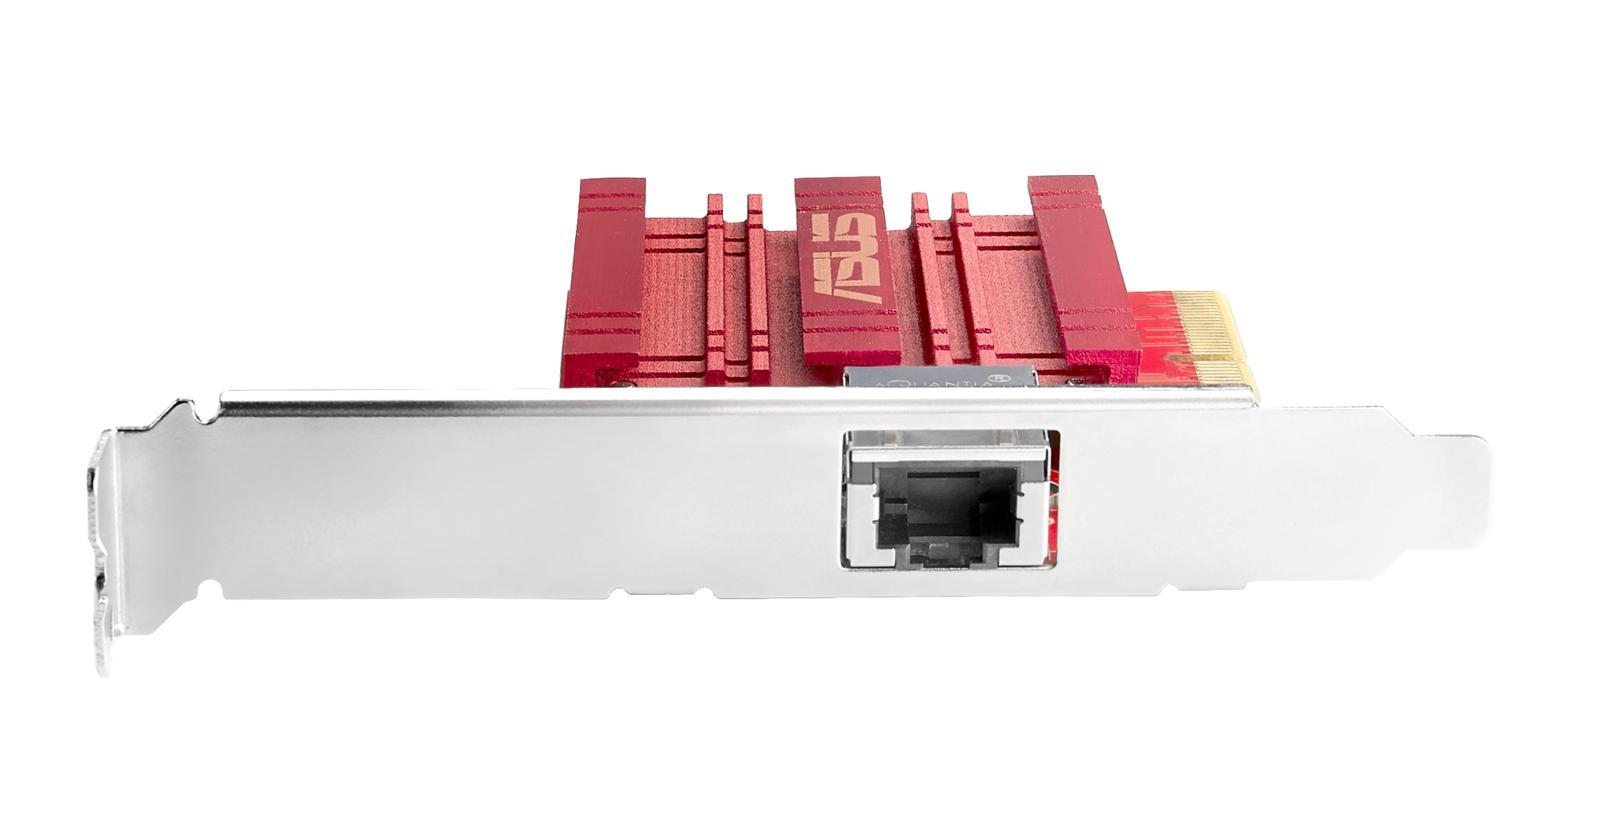 Asus XG-C100C PCIe x4 10 Gbit/s Network Adapter